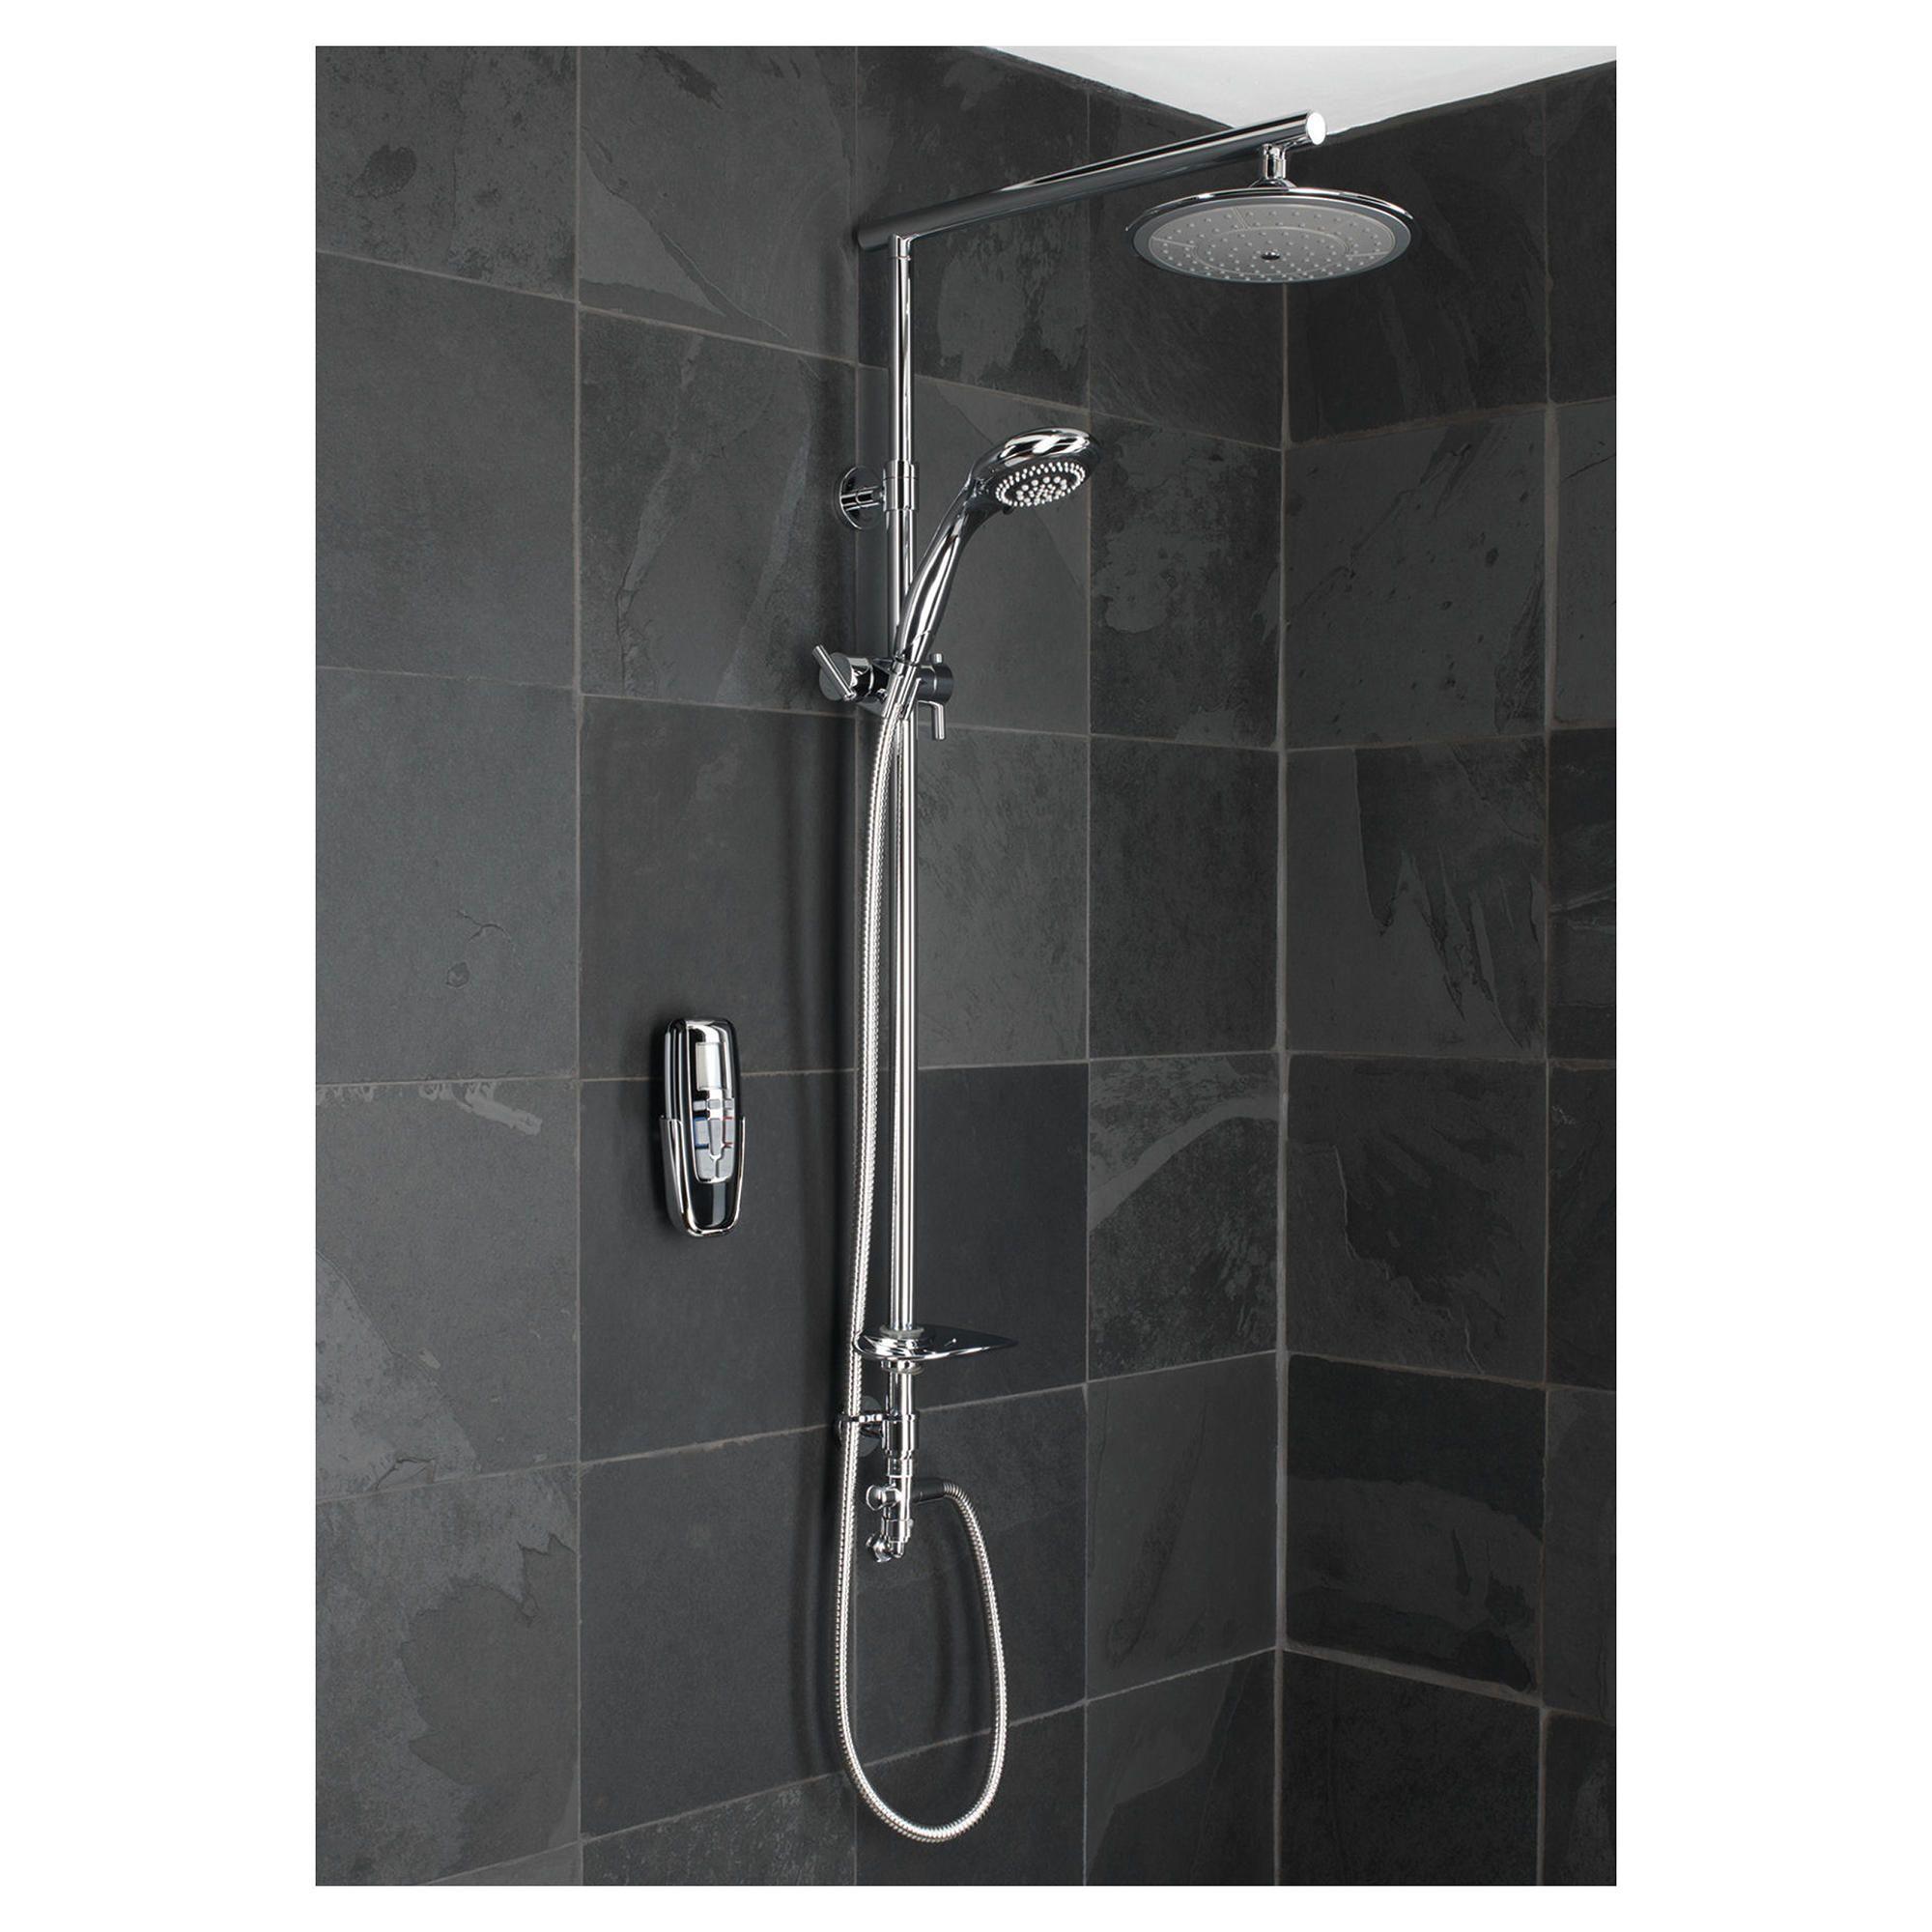 Creda Digimix Digital Mixer Shower with Portia Shower head at Tesco Direct